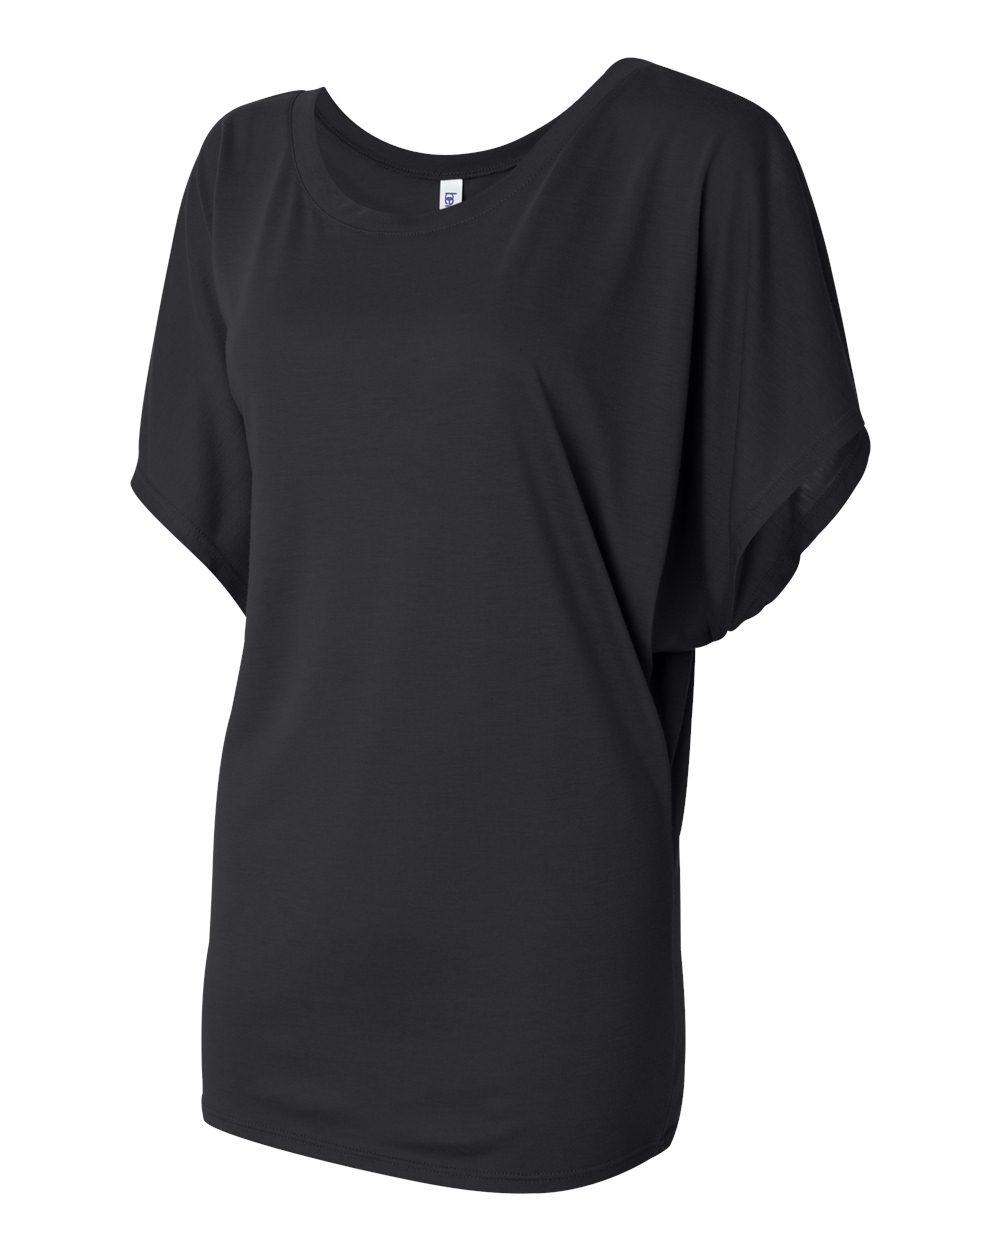 Bella-Canvas-Women-039-s-Flowy-Draped-Sleeve-Dolman-T-Shirt-8821-S-2XL thumbnail 3